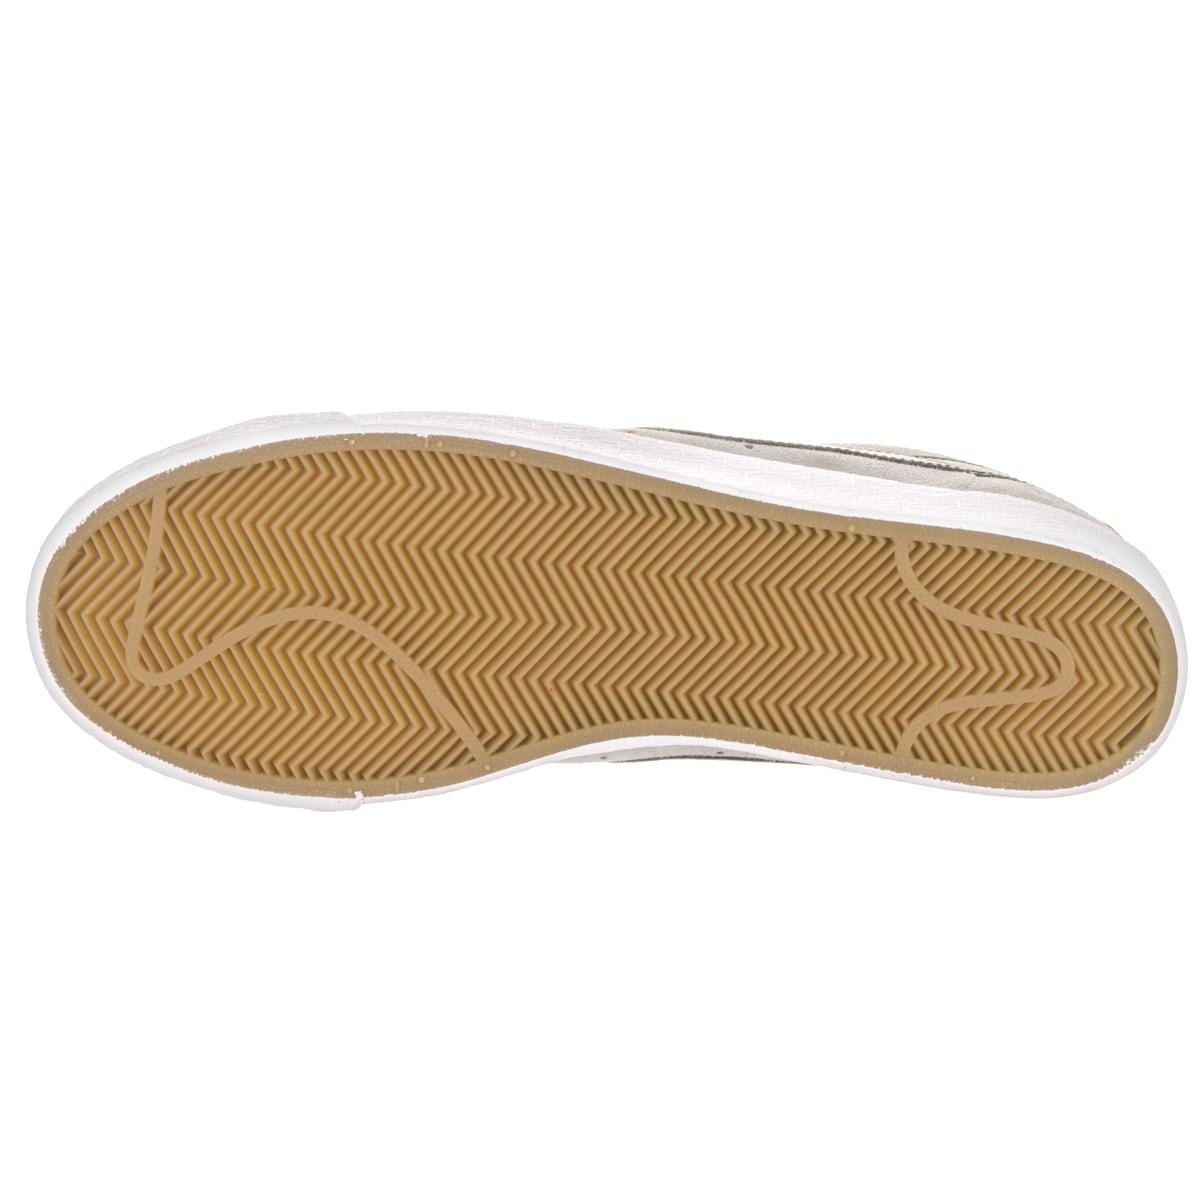 Shop Nike Men s SB Blazer Zoom Low Grey Suede Skate Shoes - Free Shipping  Today - Overstock.com - 14311452 1cf1bdd0c4f